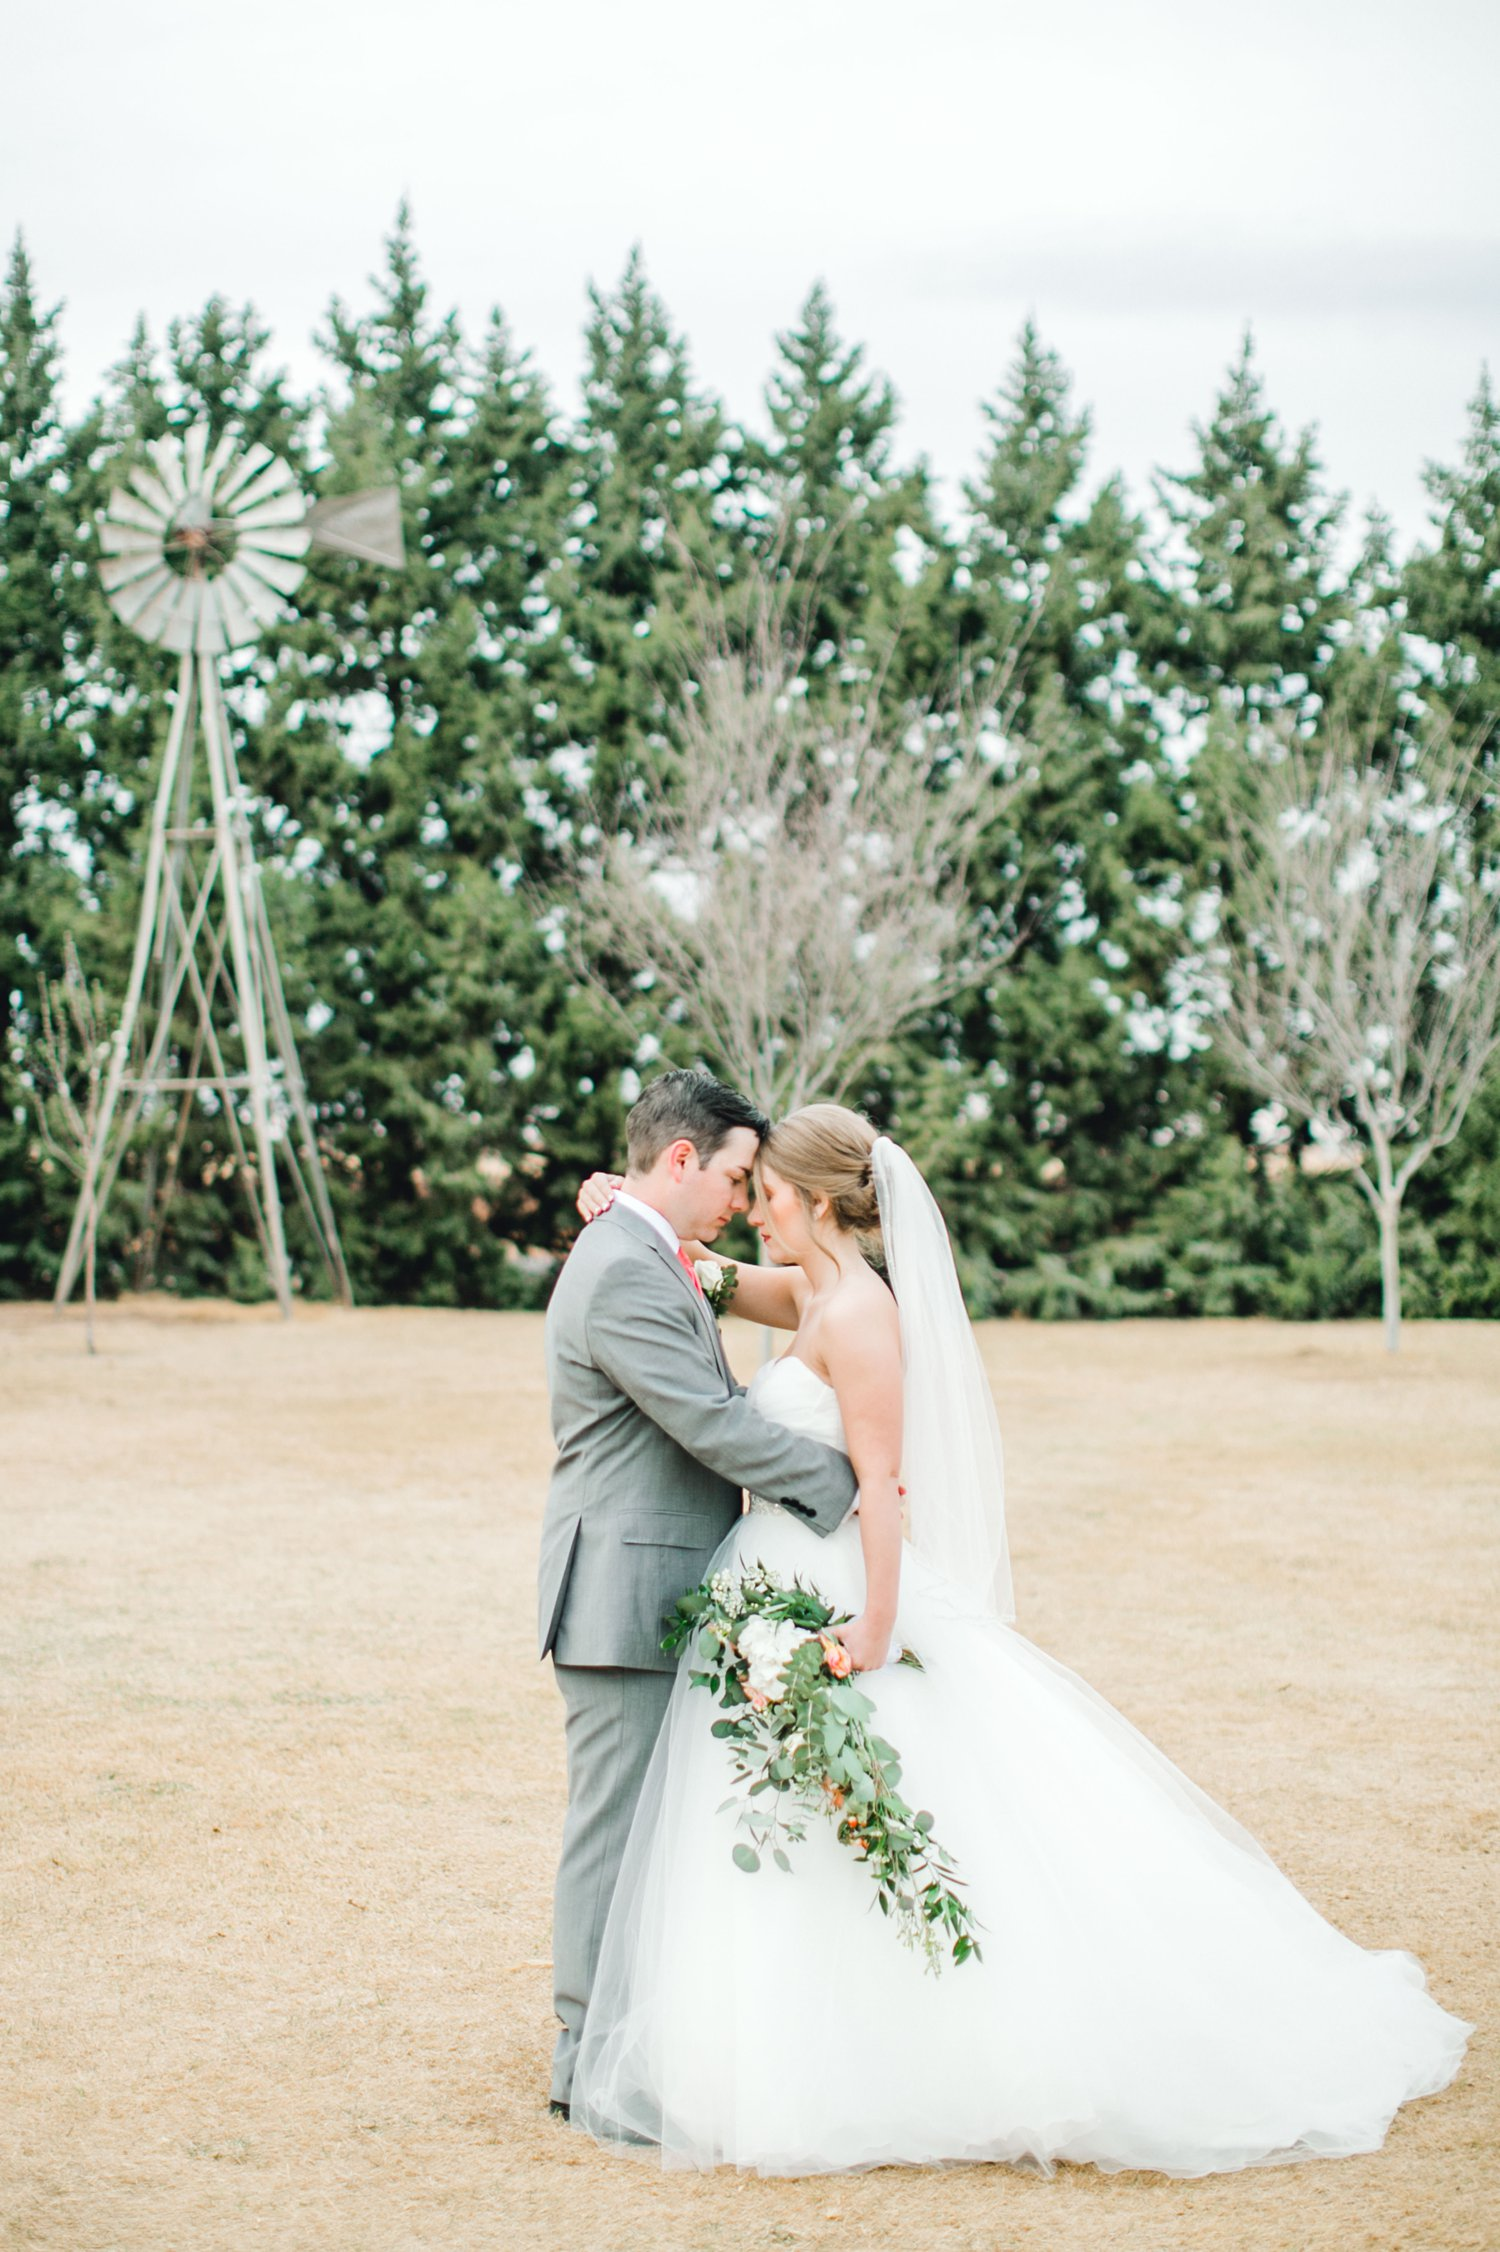 kayla-jacob-dow-cotton-creek-barn-lubbock-wedding-photographer-alleej0117.jpg